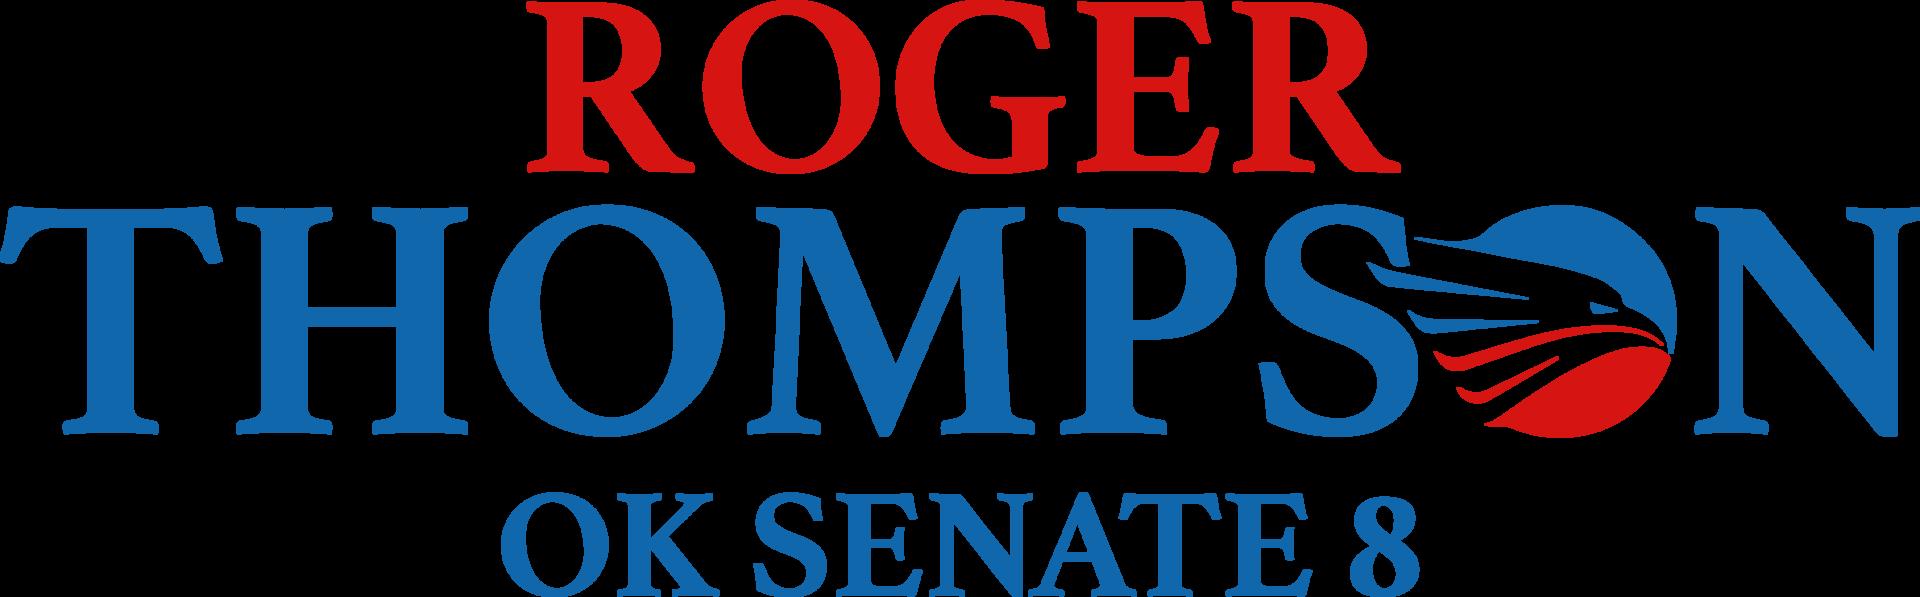 Thompson logo final